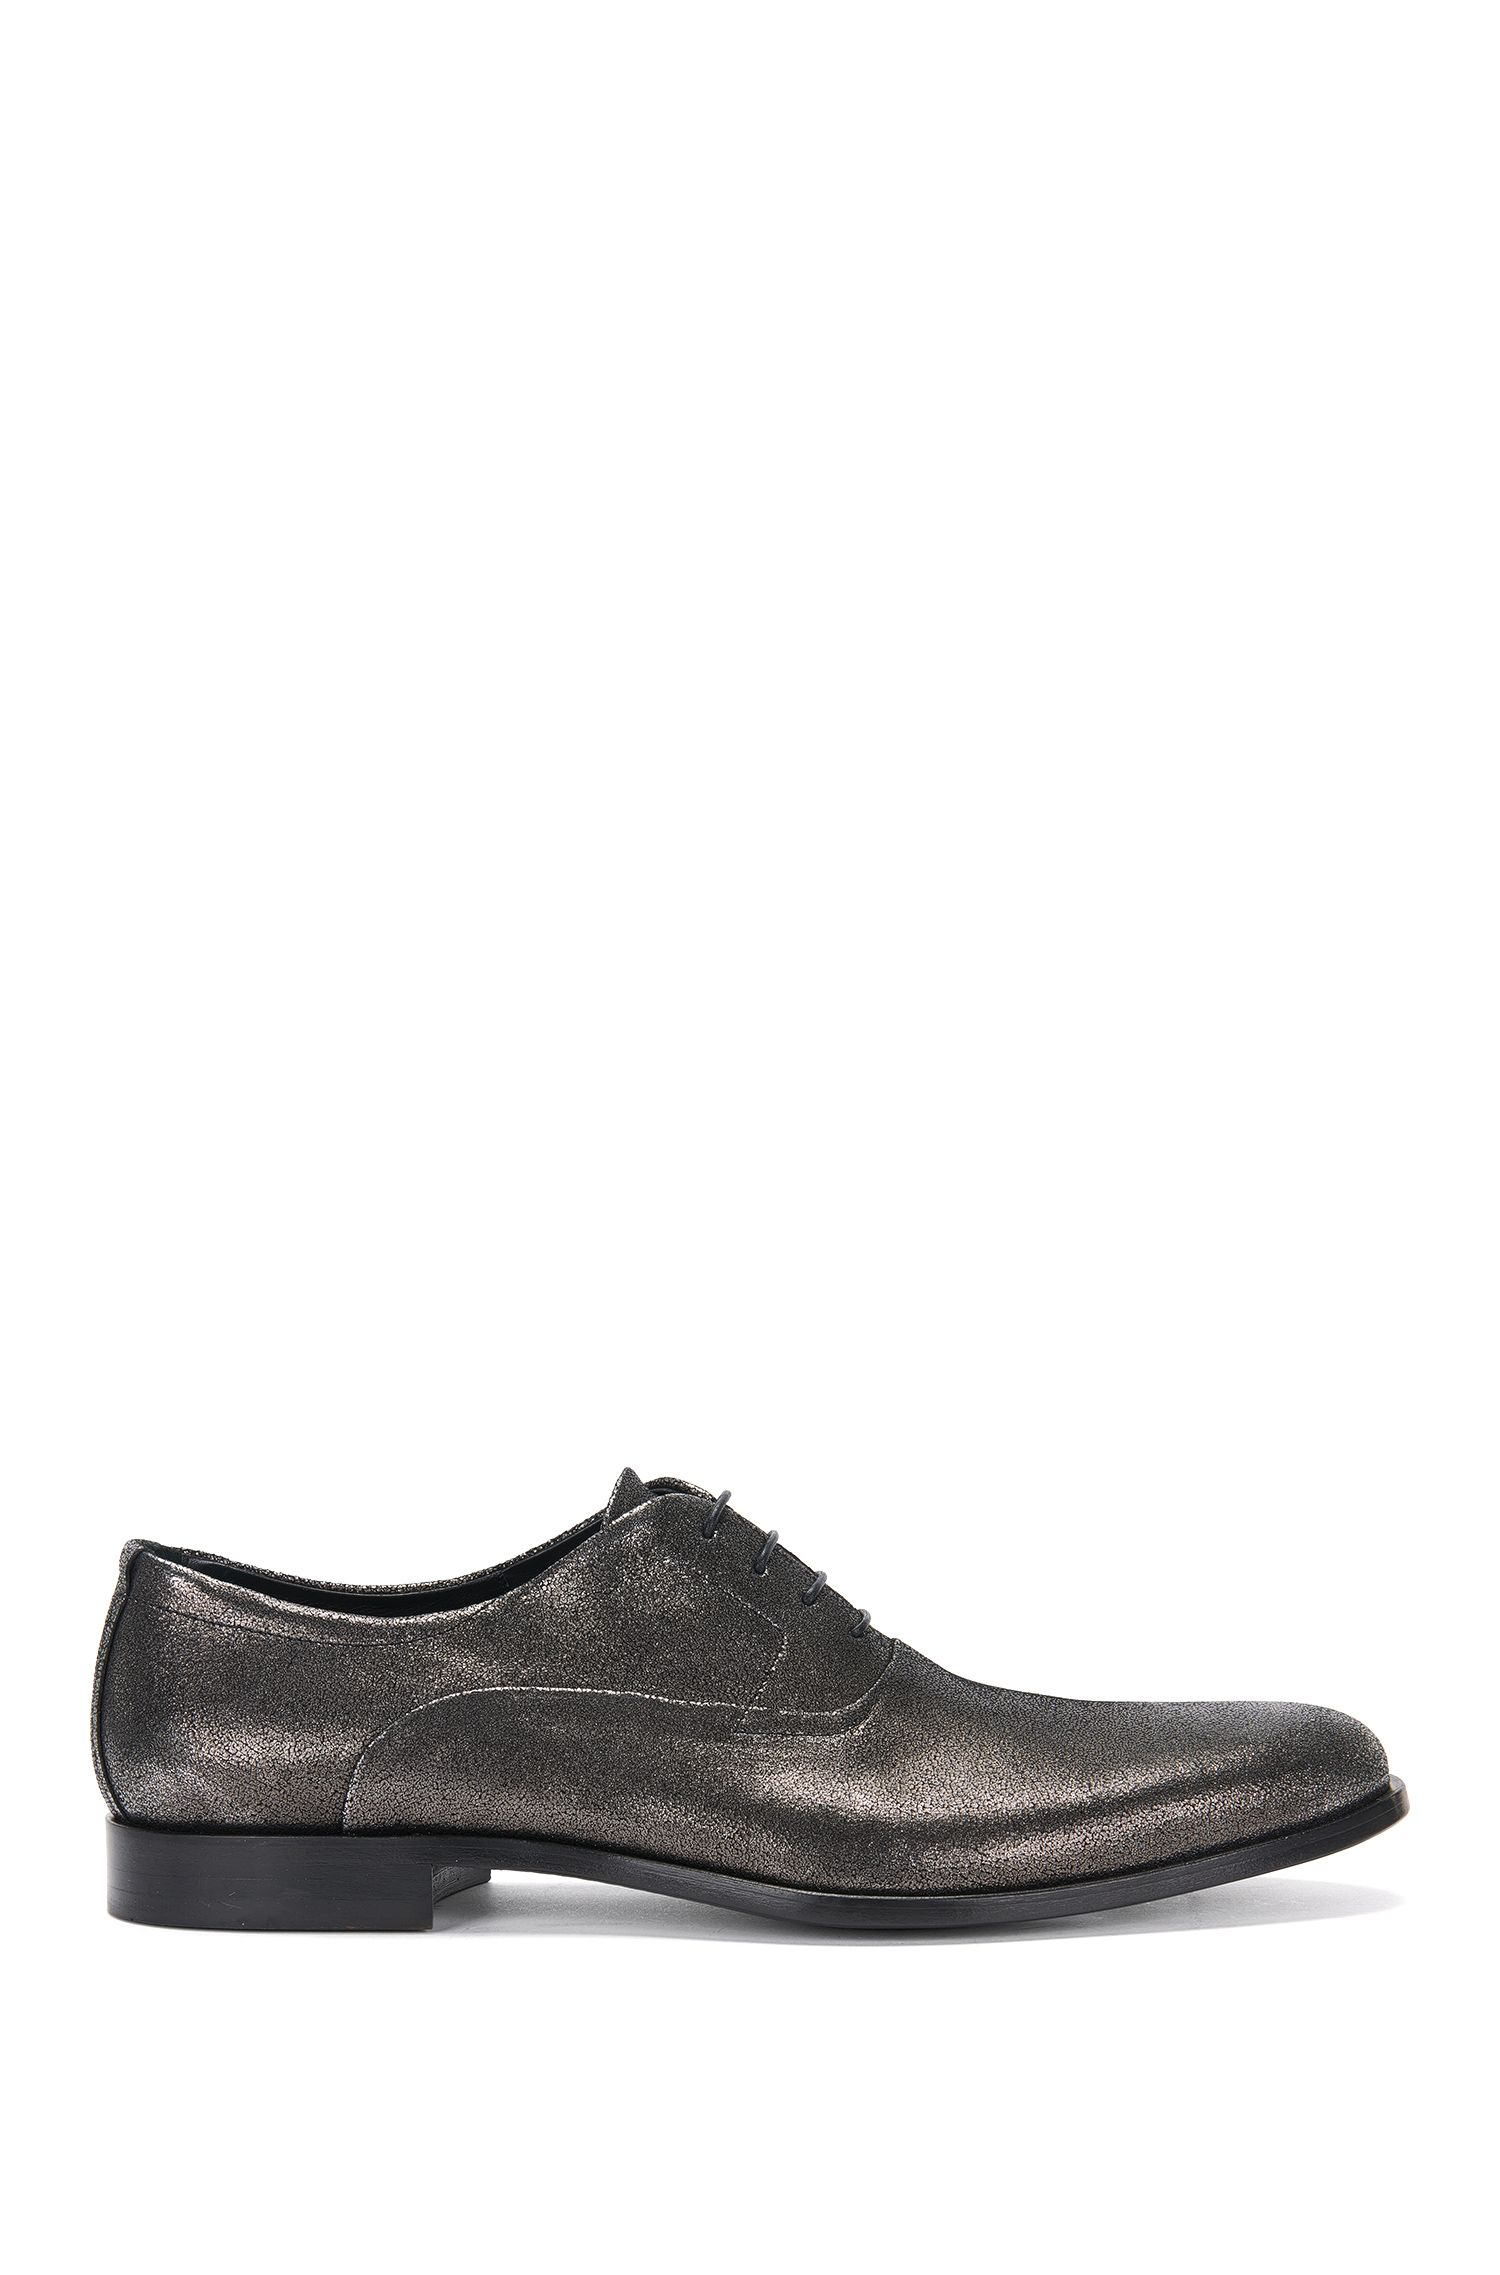 Italian Leather Suede Metallic Oxford Shoe | Sigma Oxfr Sdg, Dark Grey